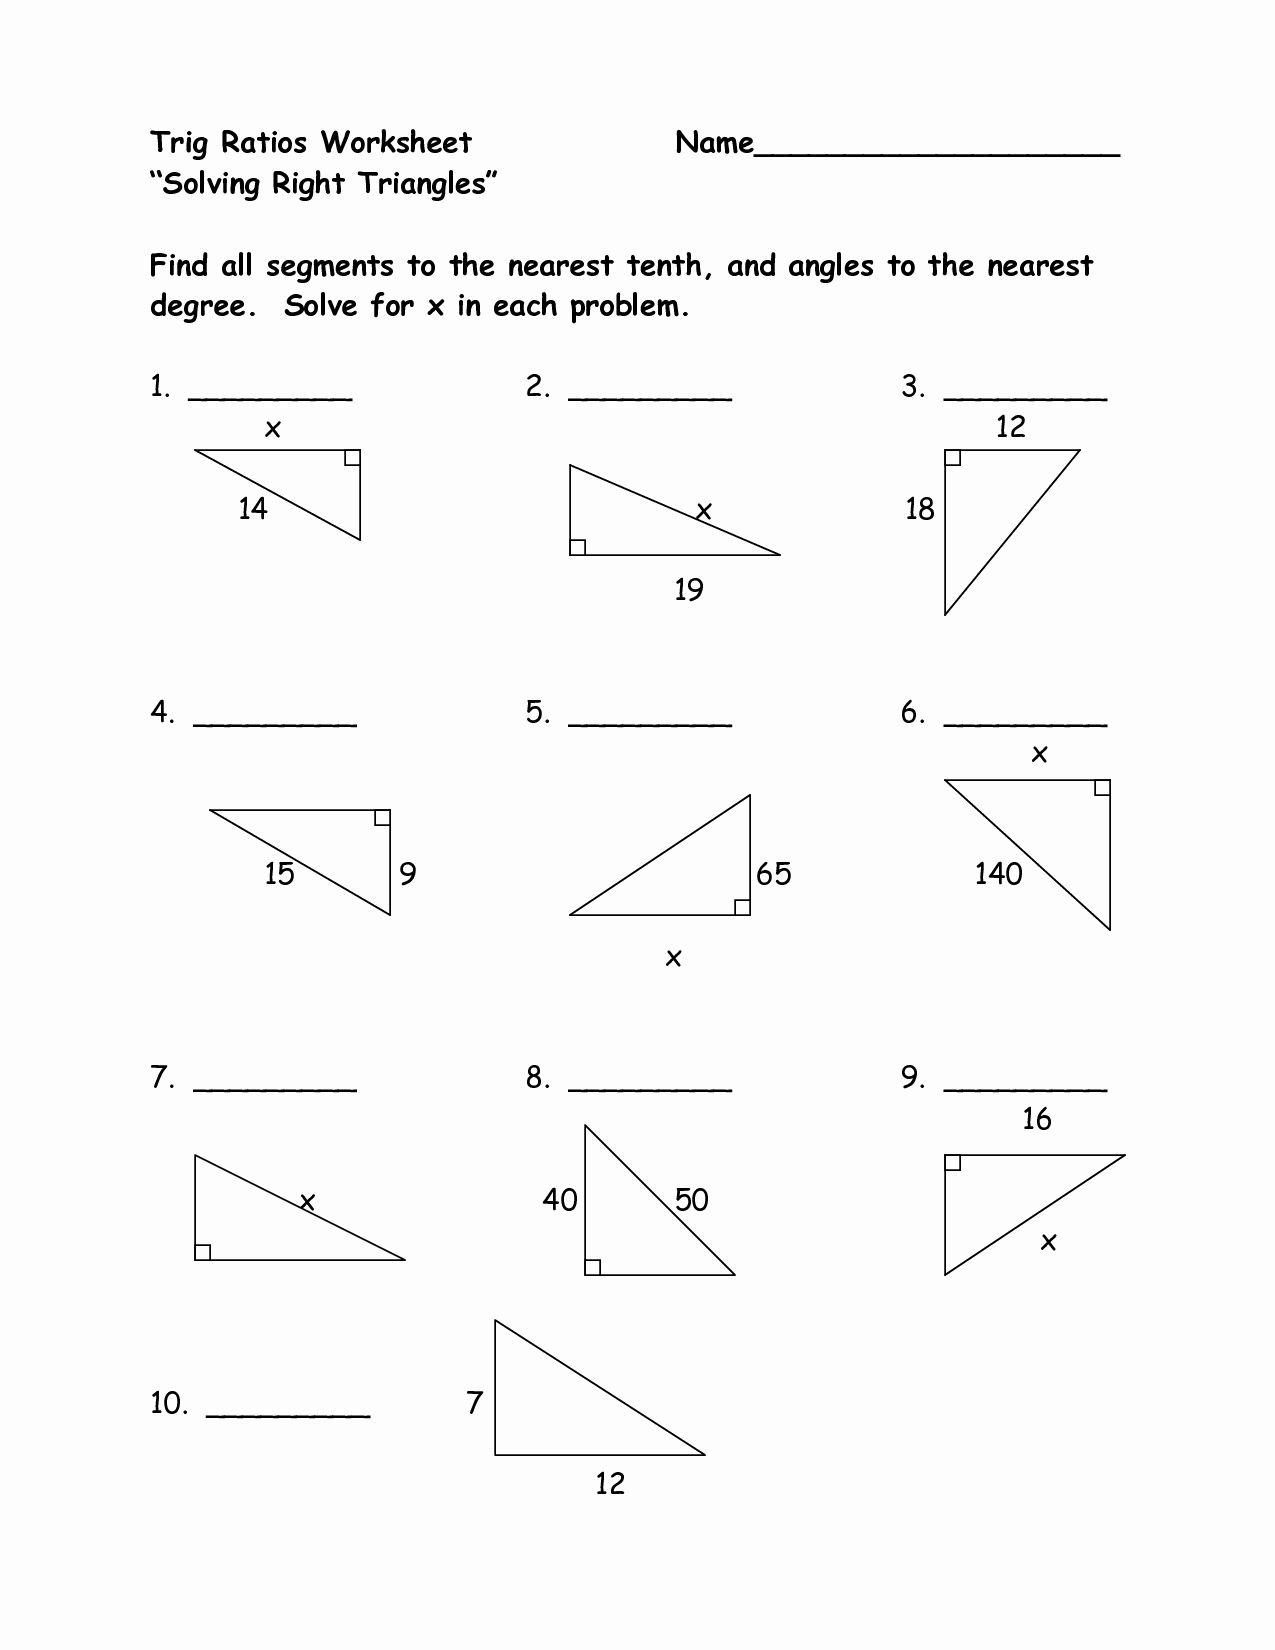 Right Triangle Trigonometry Worksheet Unique Trigonometry